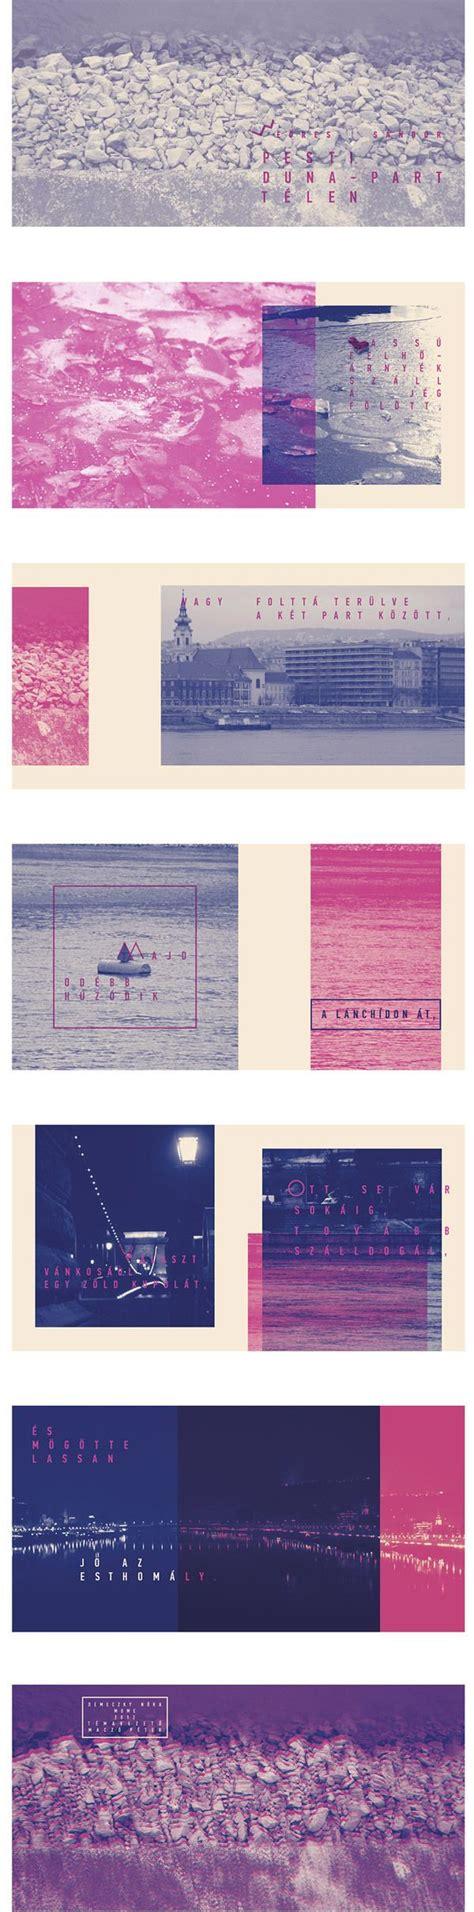 editorial layout inspiration editorial design inspiration